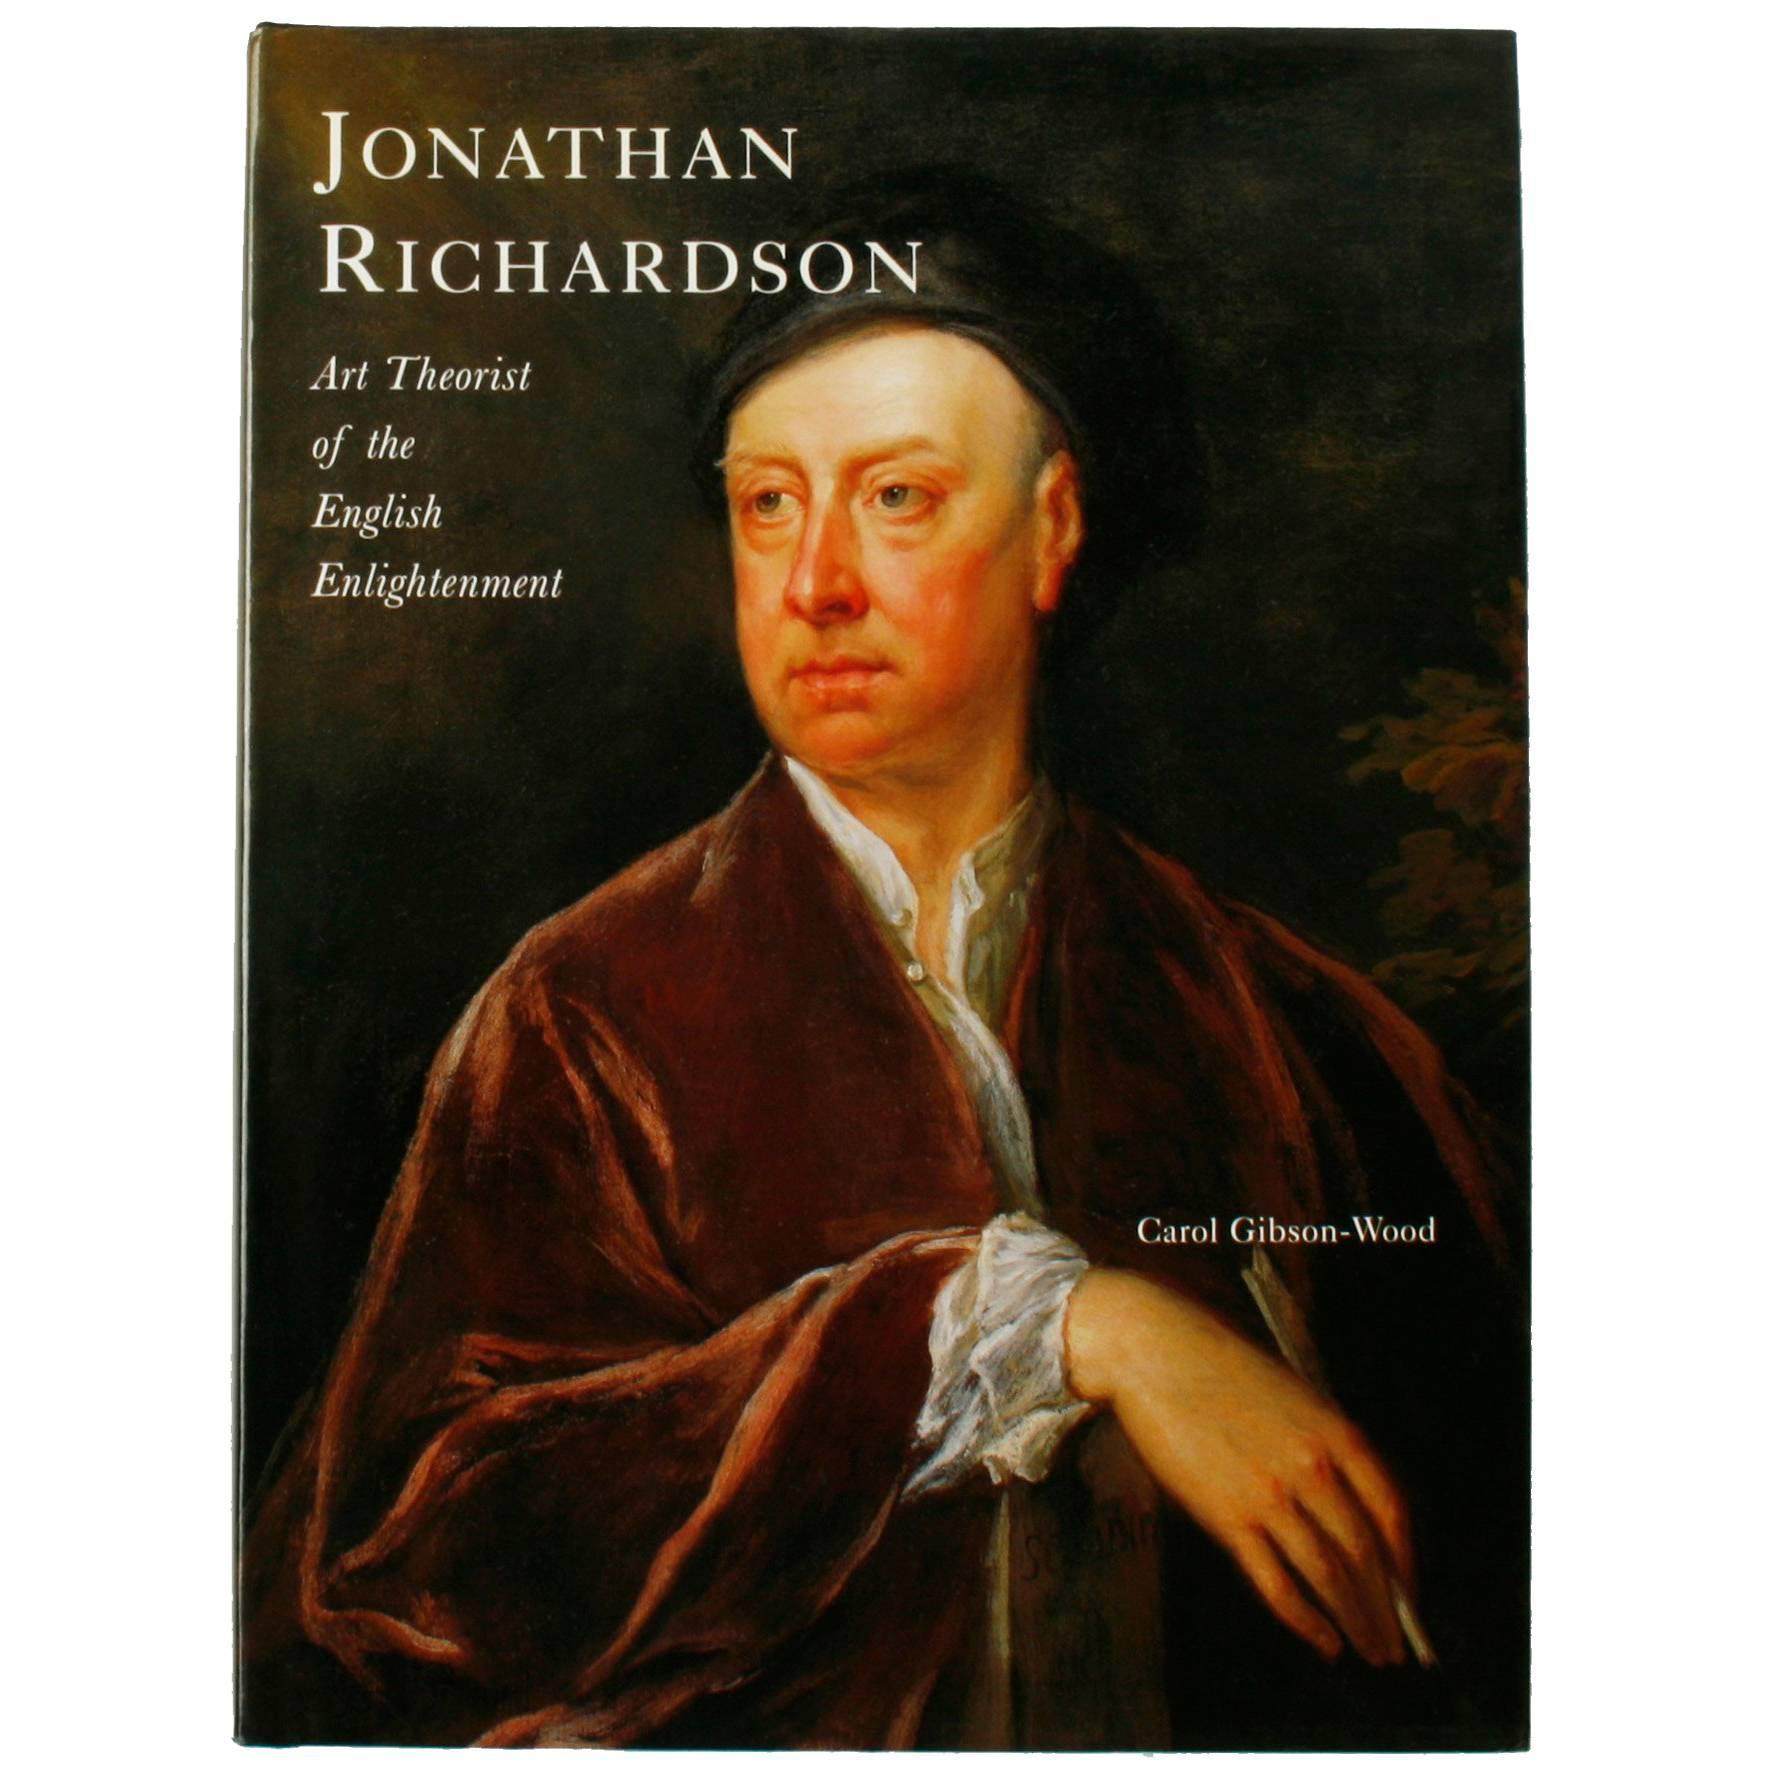 Jonathan Richardson: Art Theorist of the English Enlightenment, First Edition